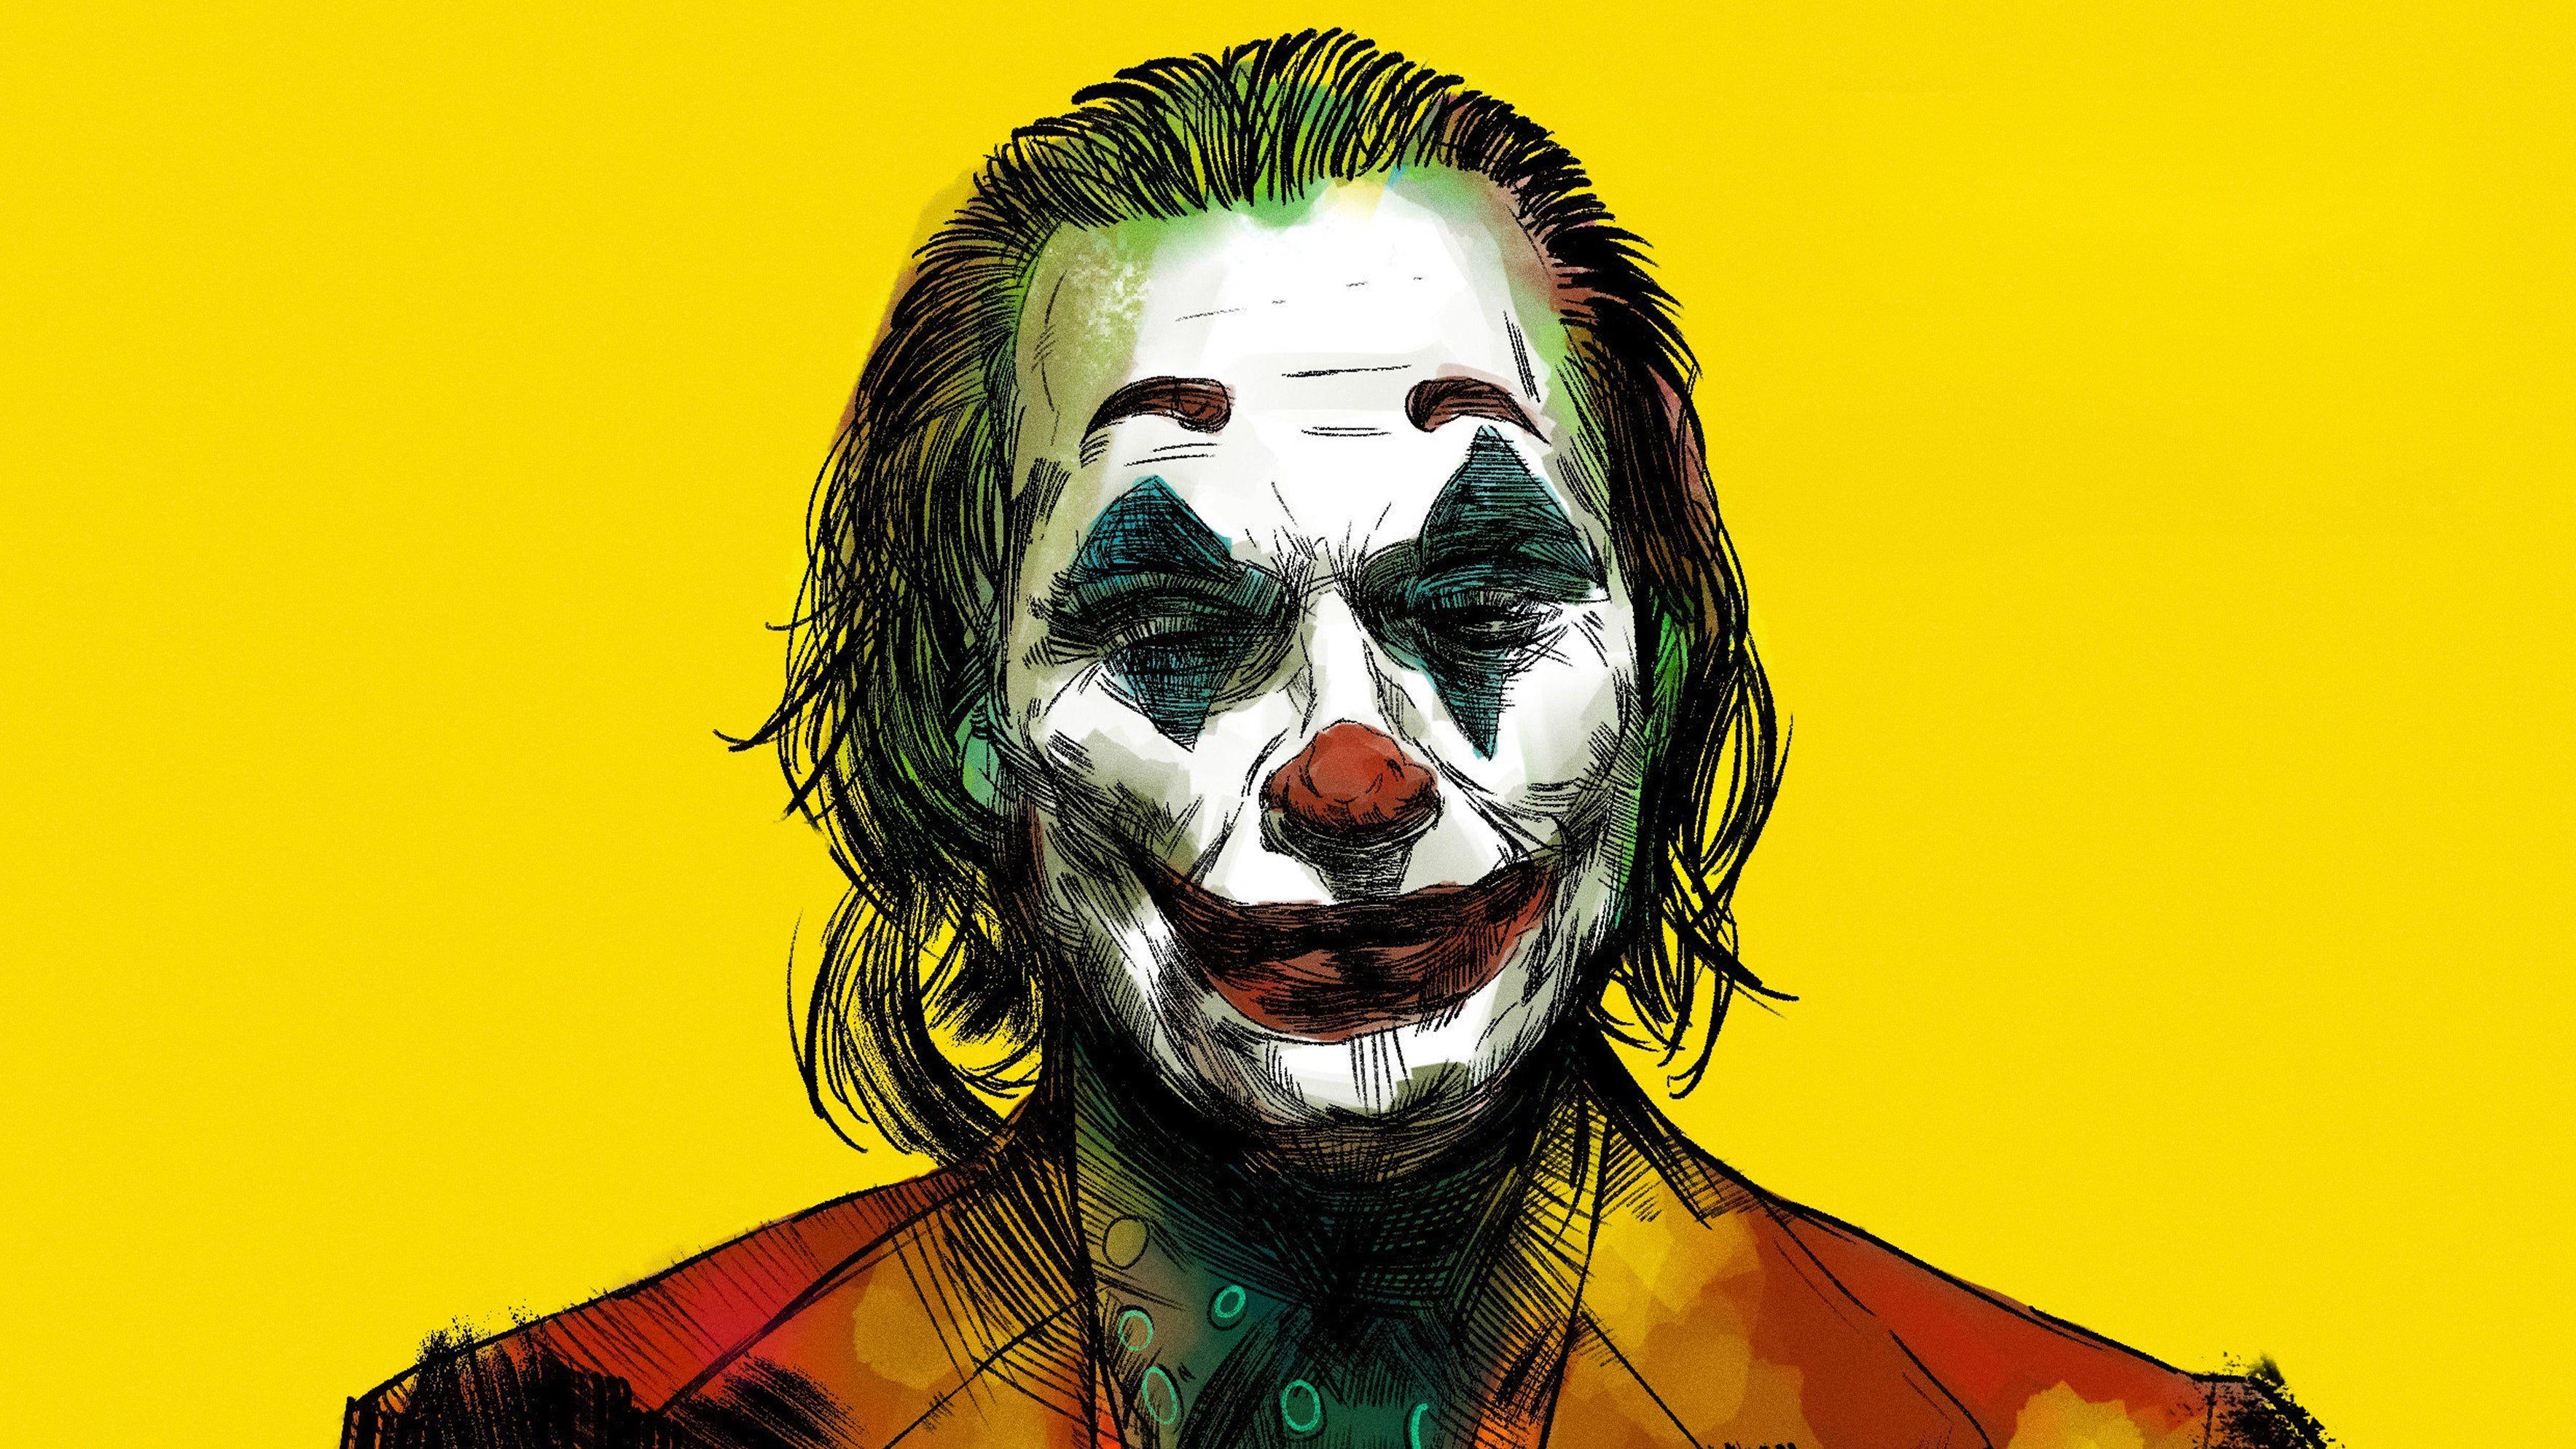 Joker Yellow Bg Hd Wallpaper Joker Images Joker Hd Wallpaper Joker Wallpapers